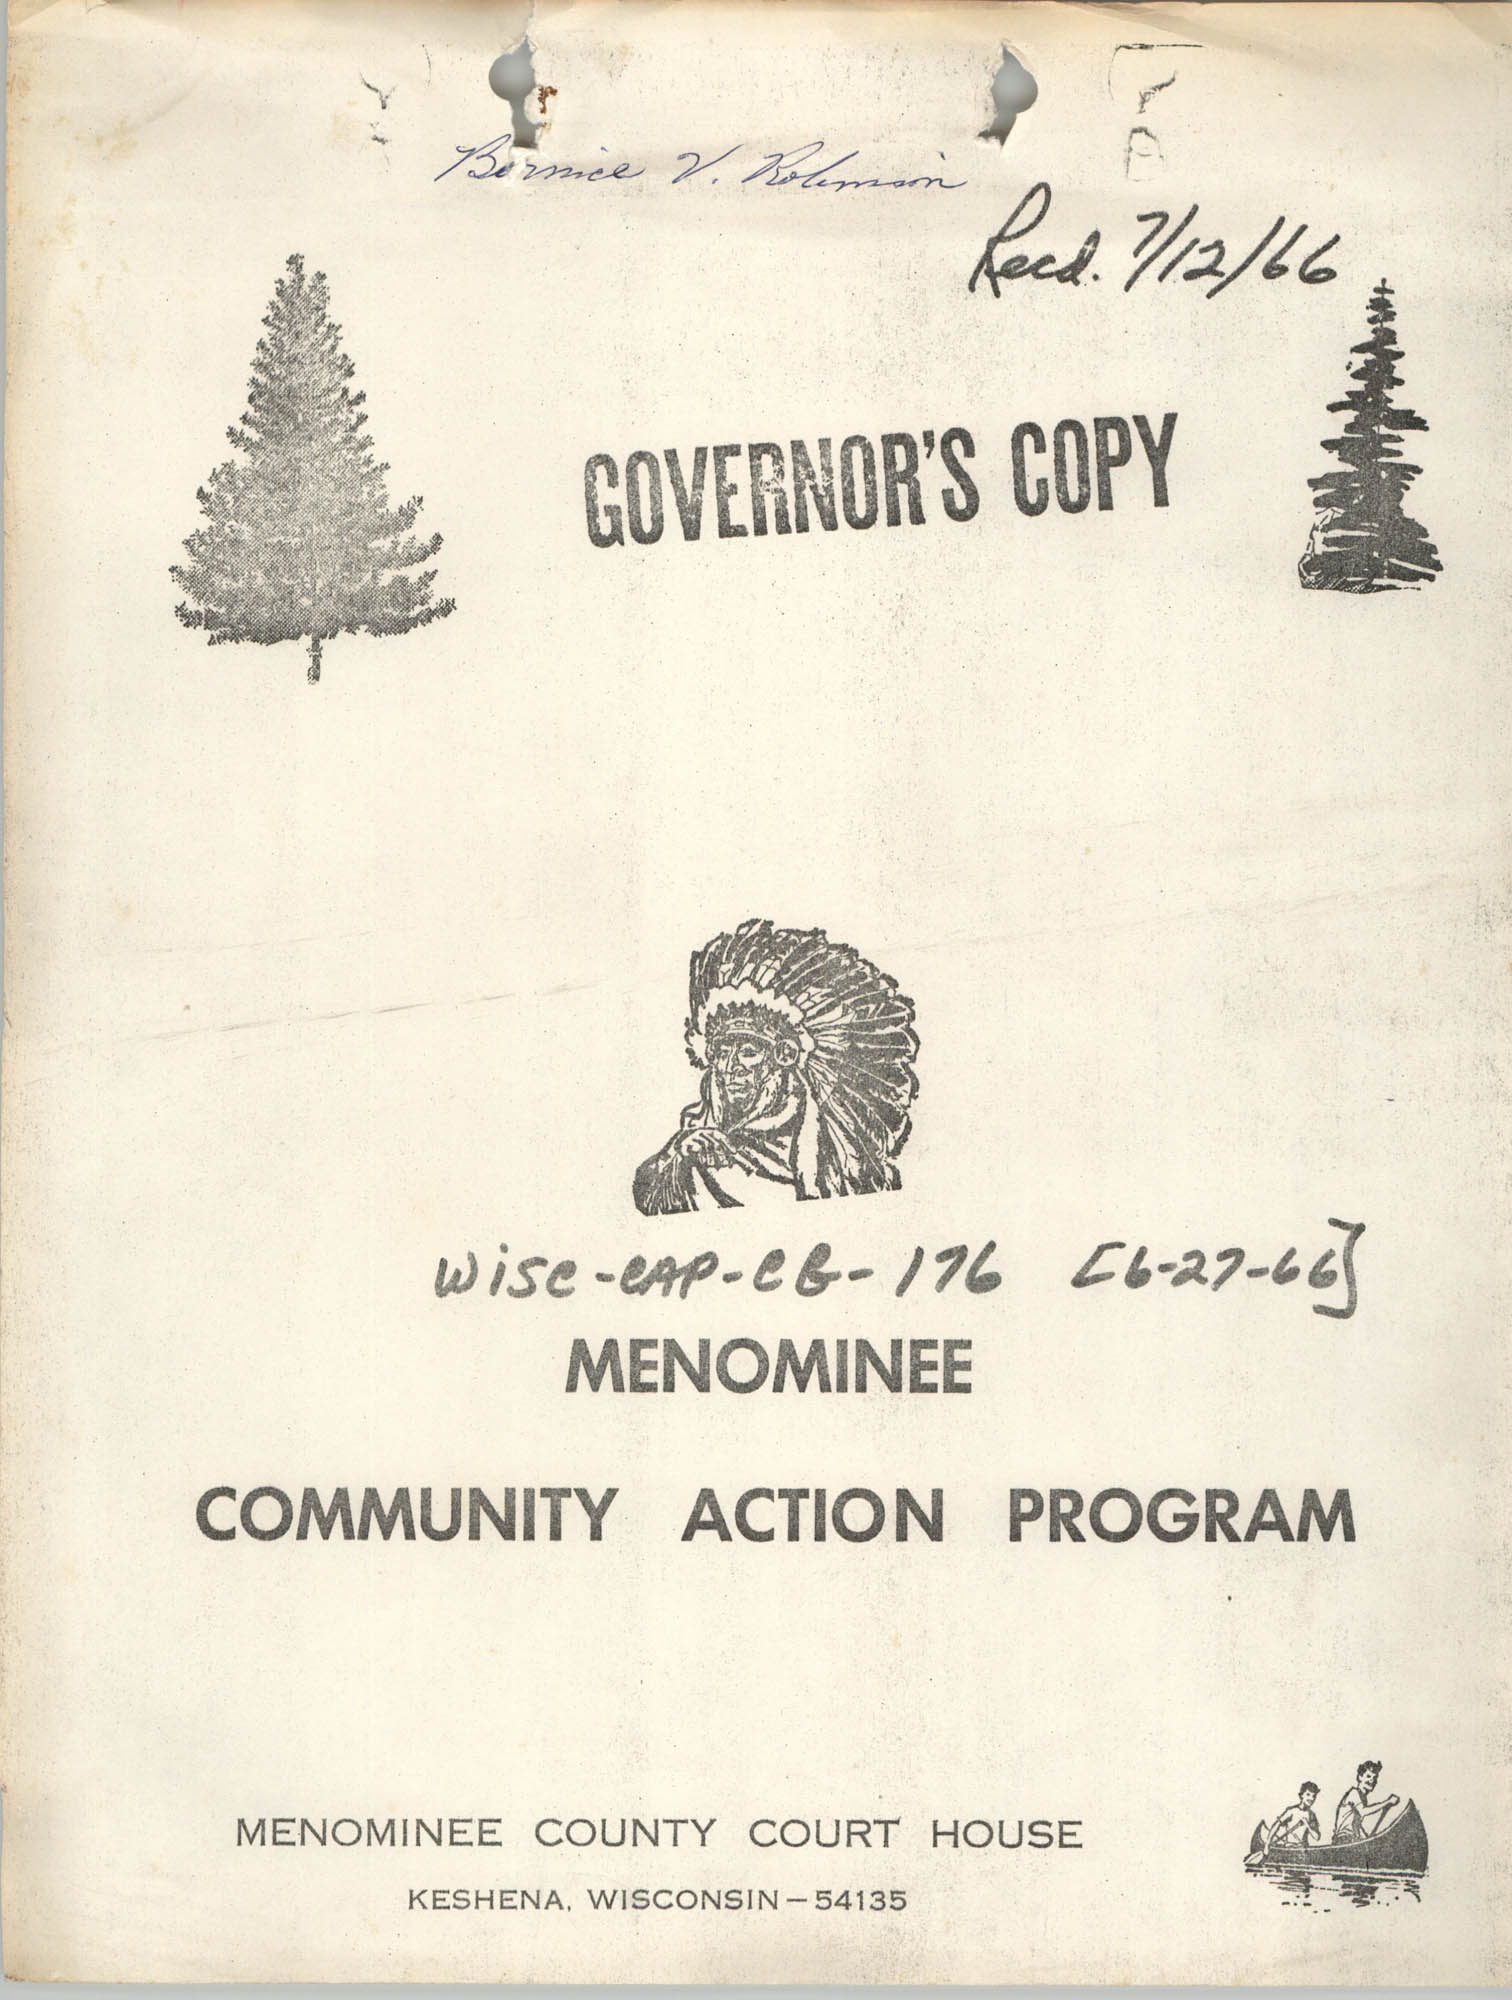 Menominee Community Action Program, Governor's Copy, Cover